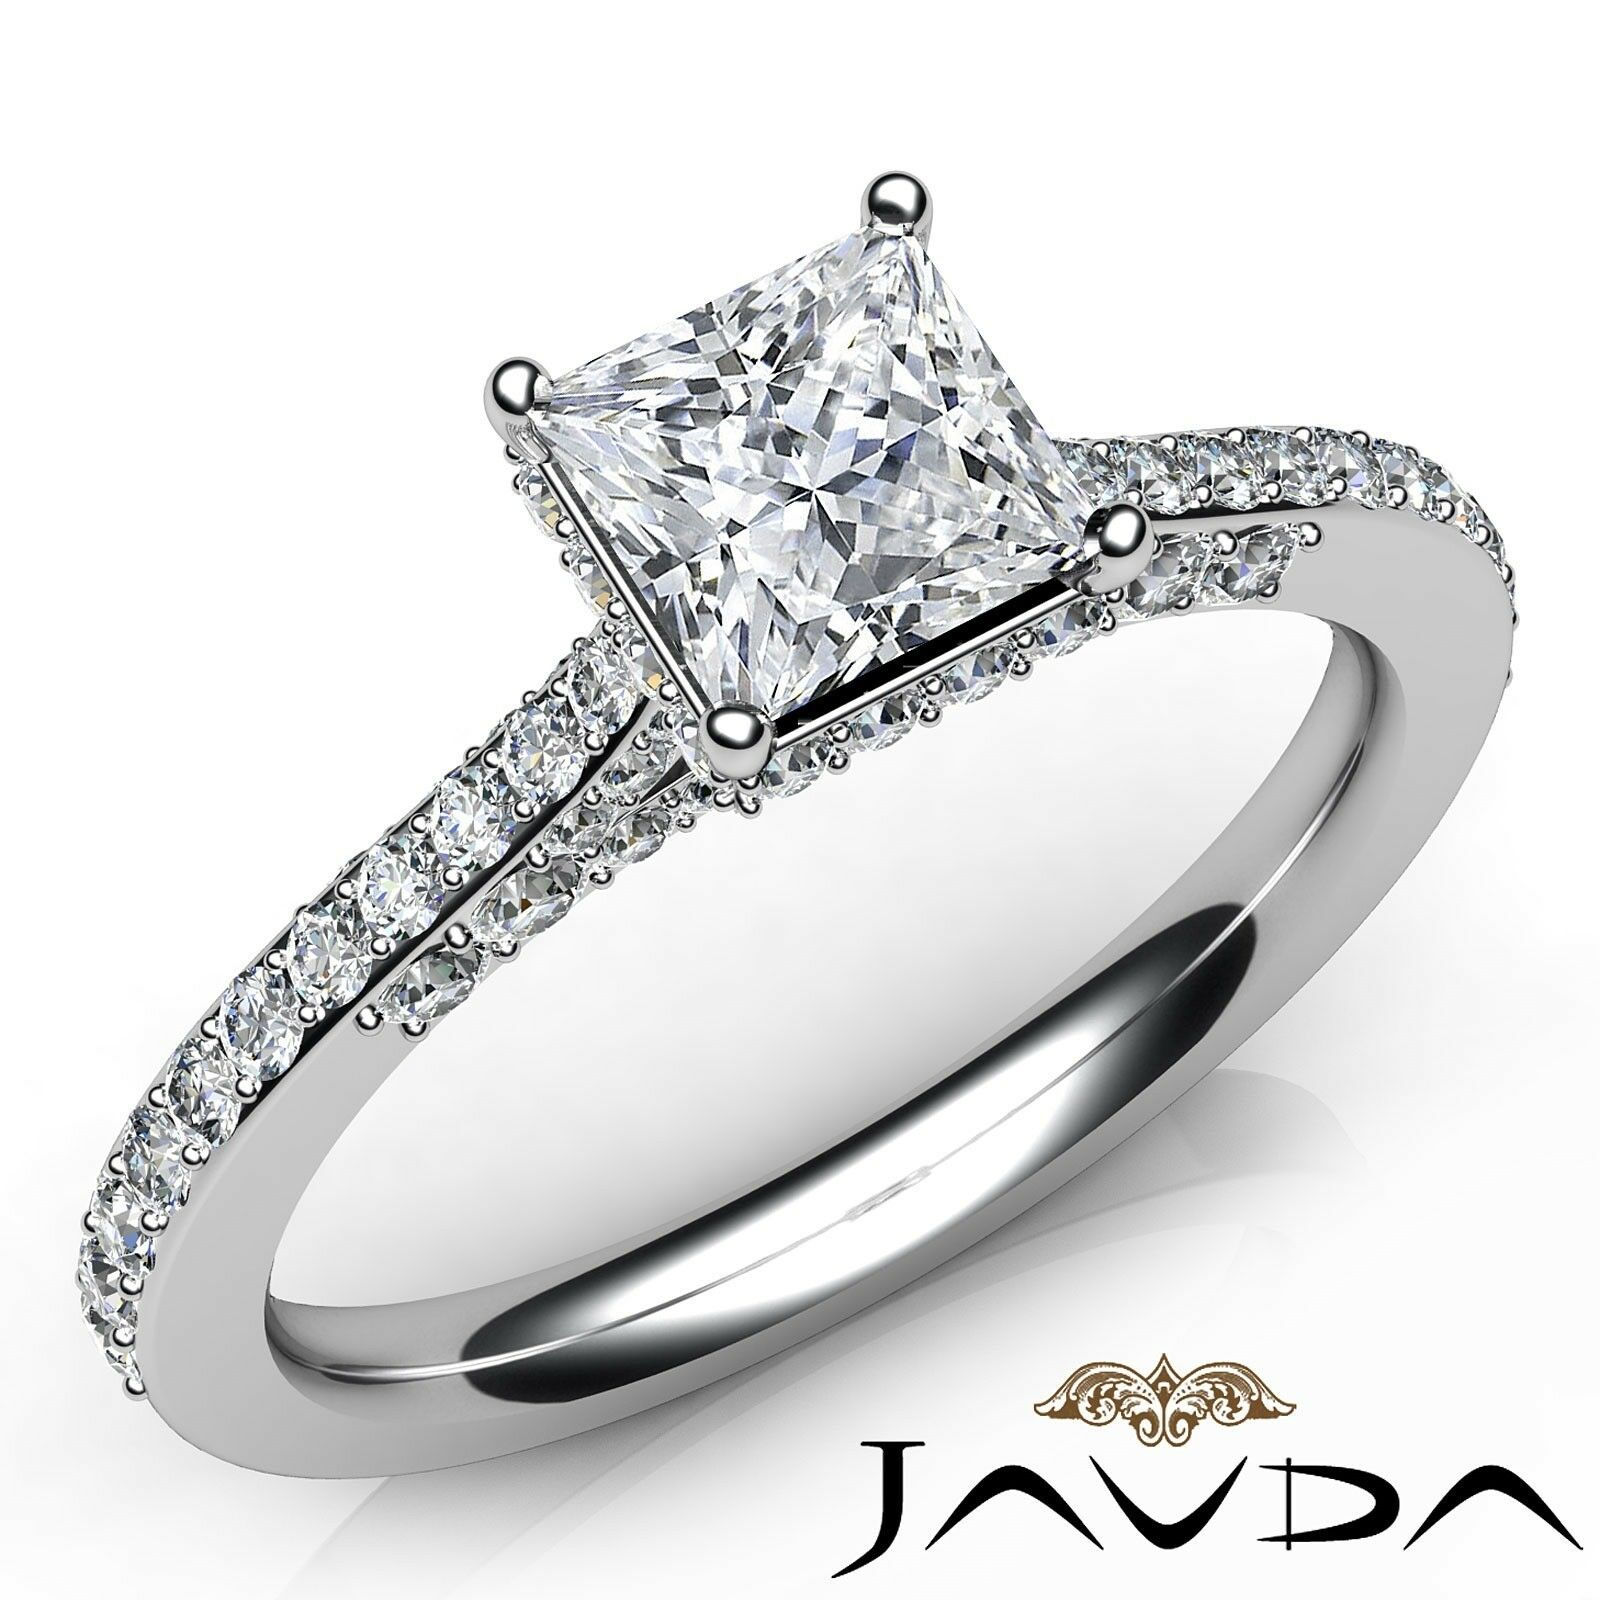 1.15ctw Bridge Accent Princess Diamond Engagement Ring GIA F-VVS1 White Gold New